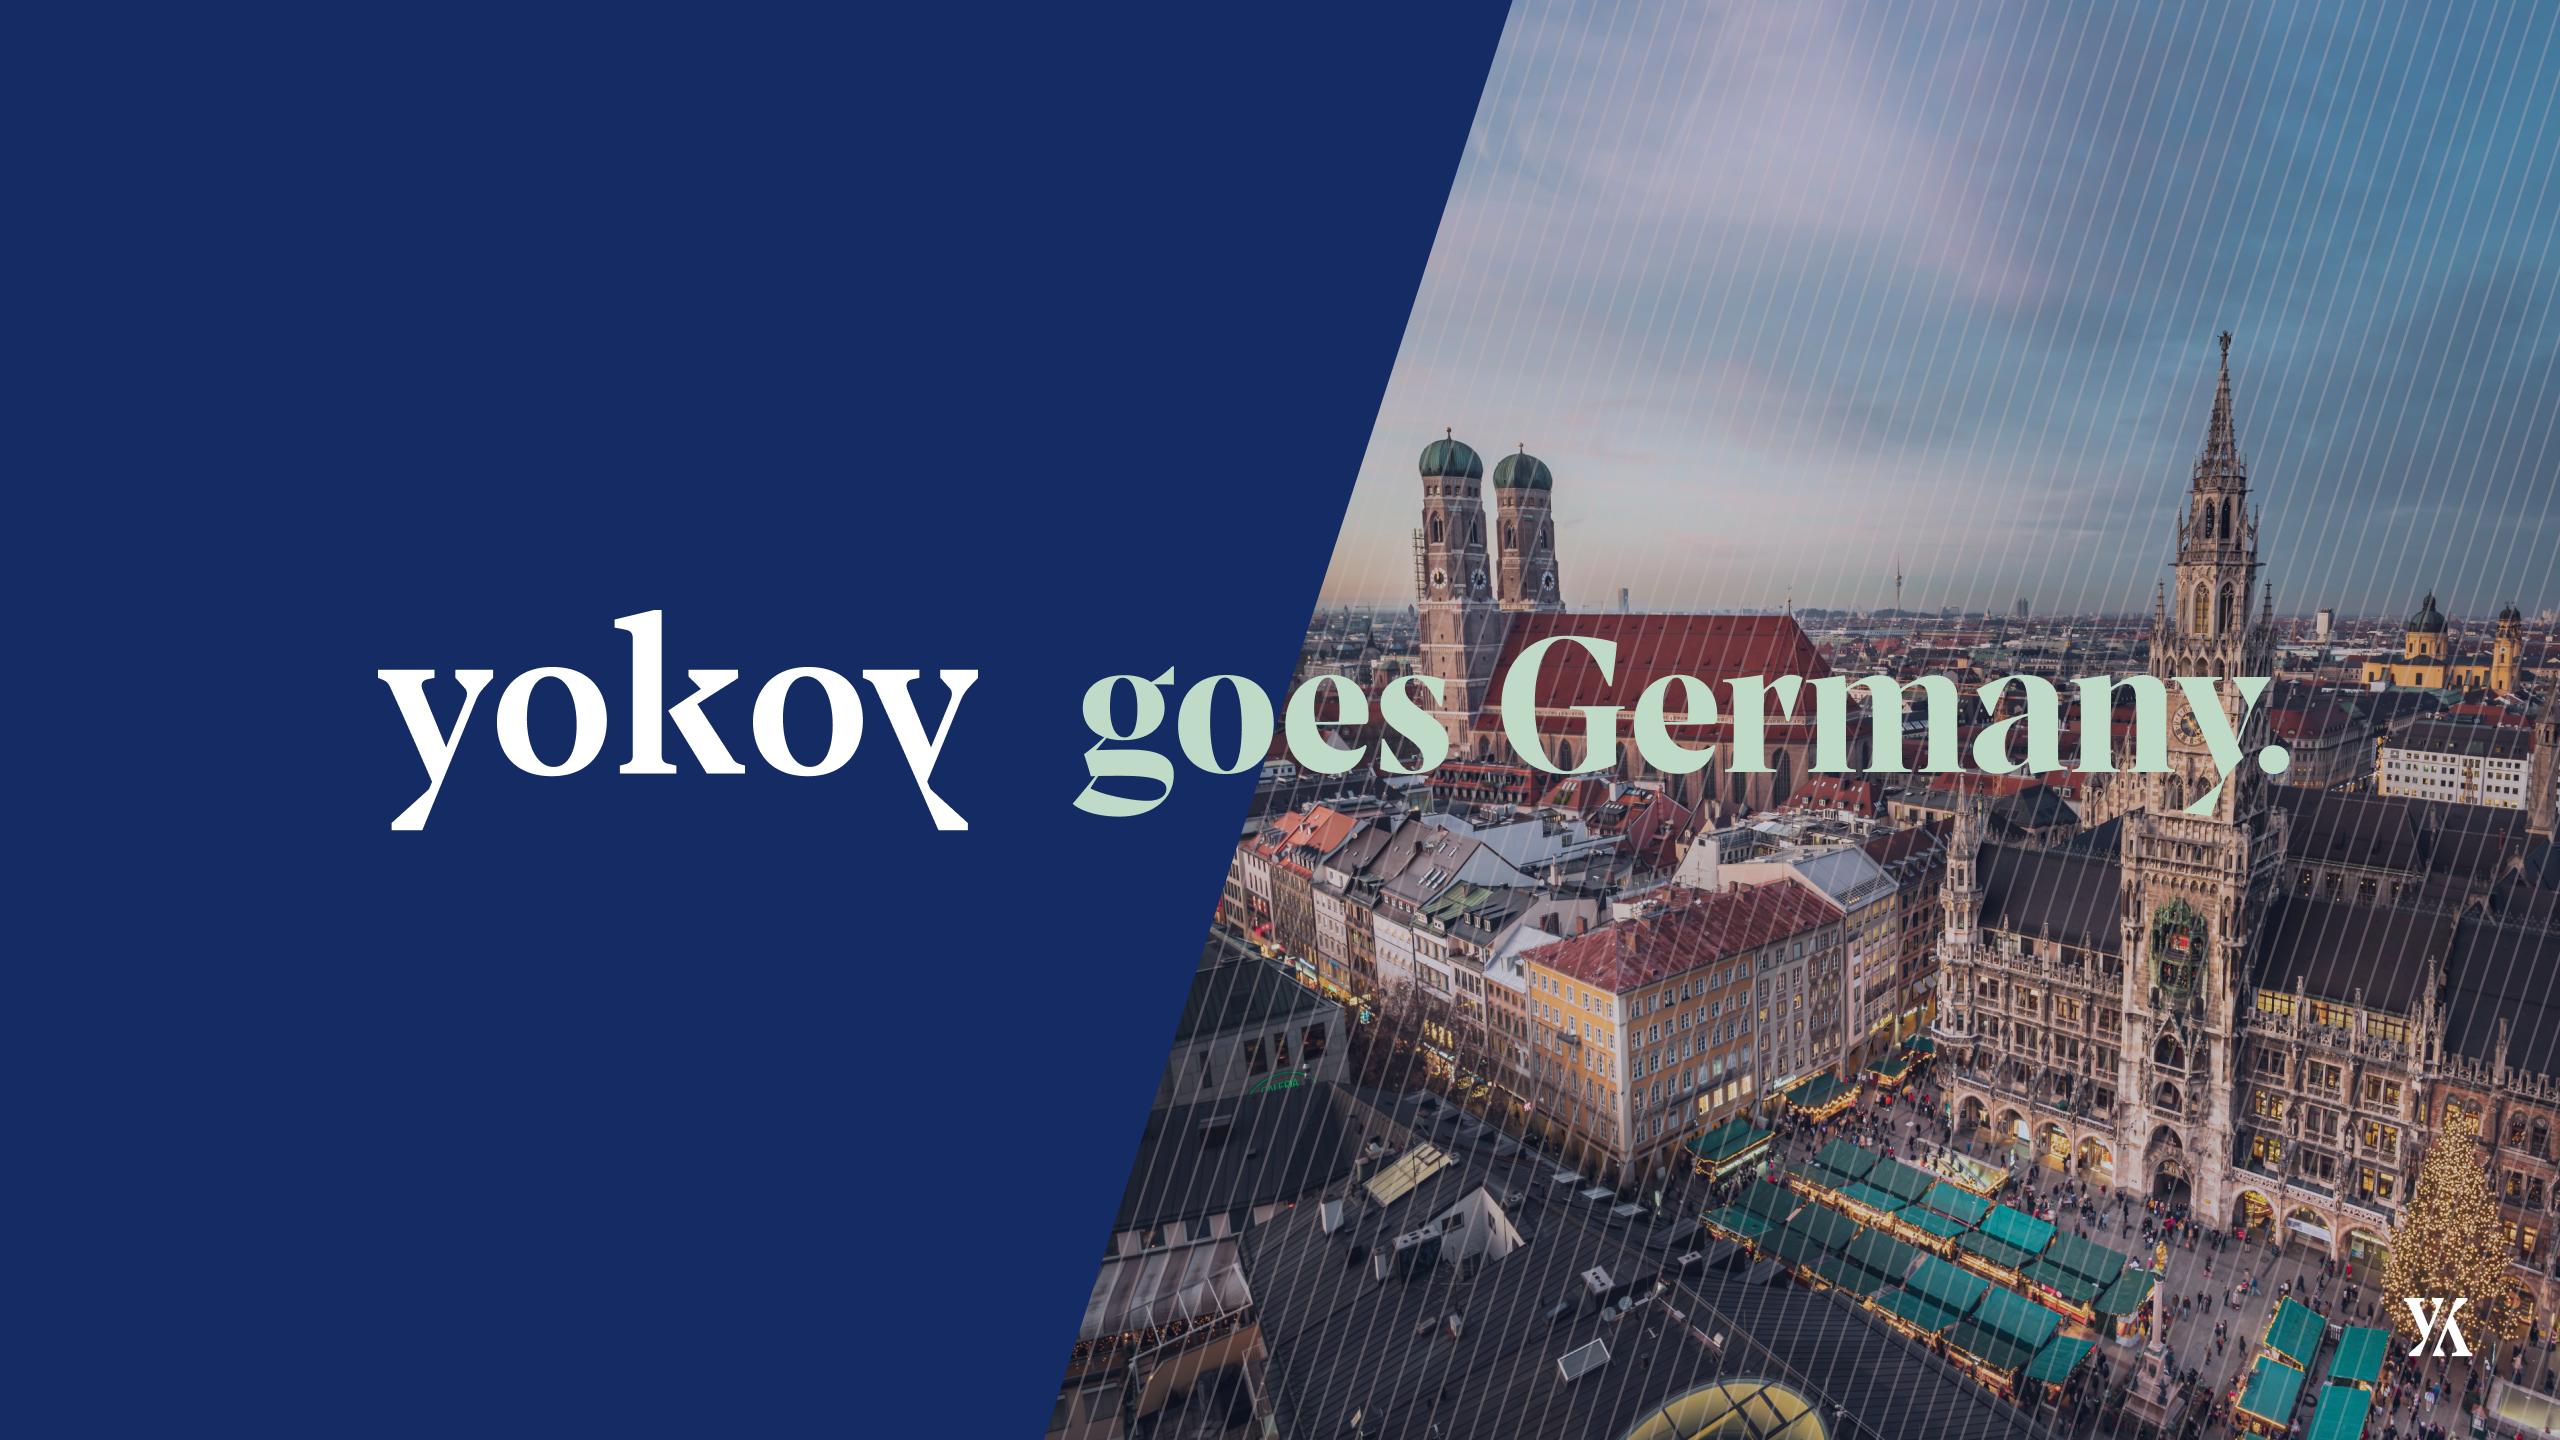 Yokoy goes Germany